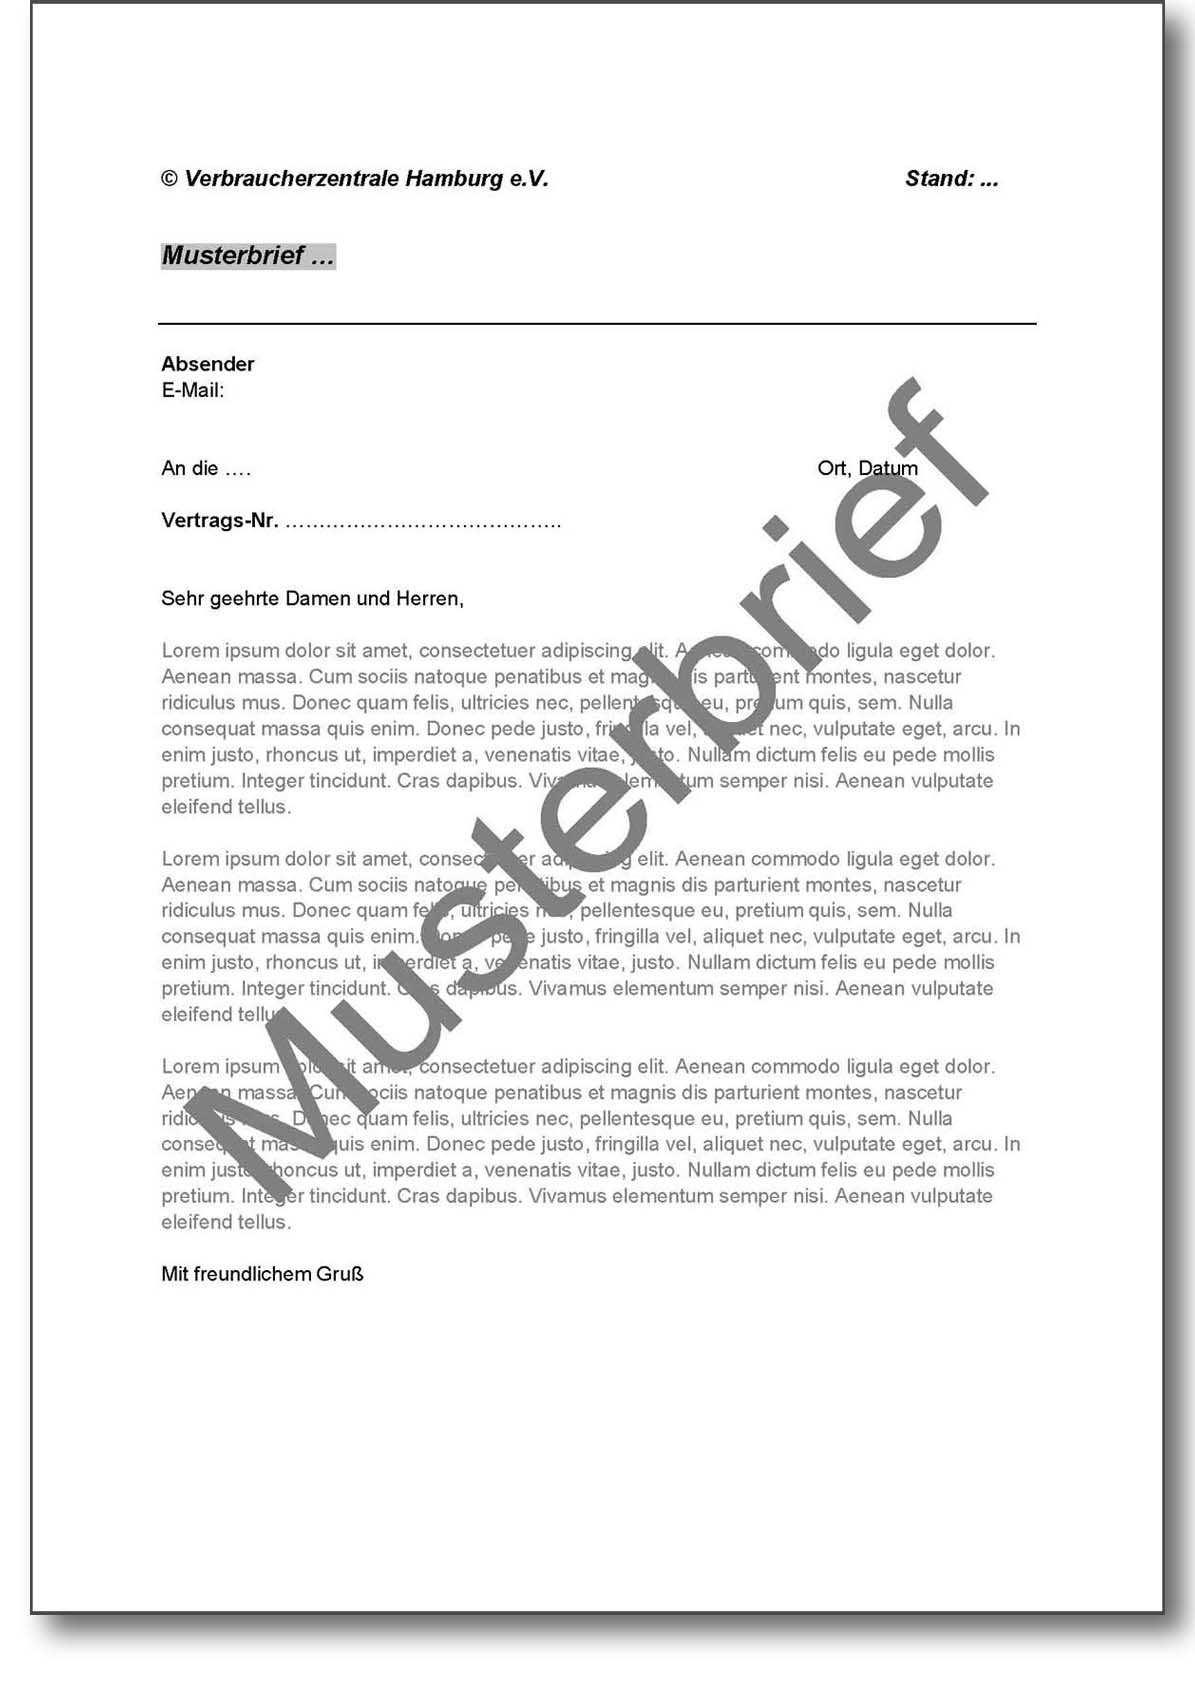 Musterbrief Mobellieferanten Oder Handler In Verzug Setzen Verbraucherzentrale